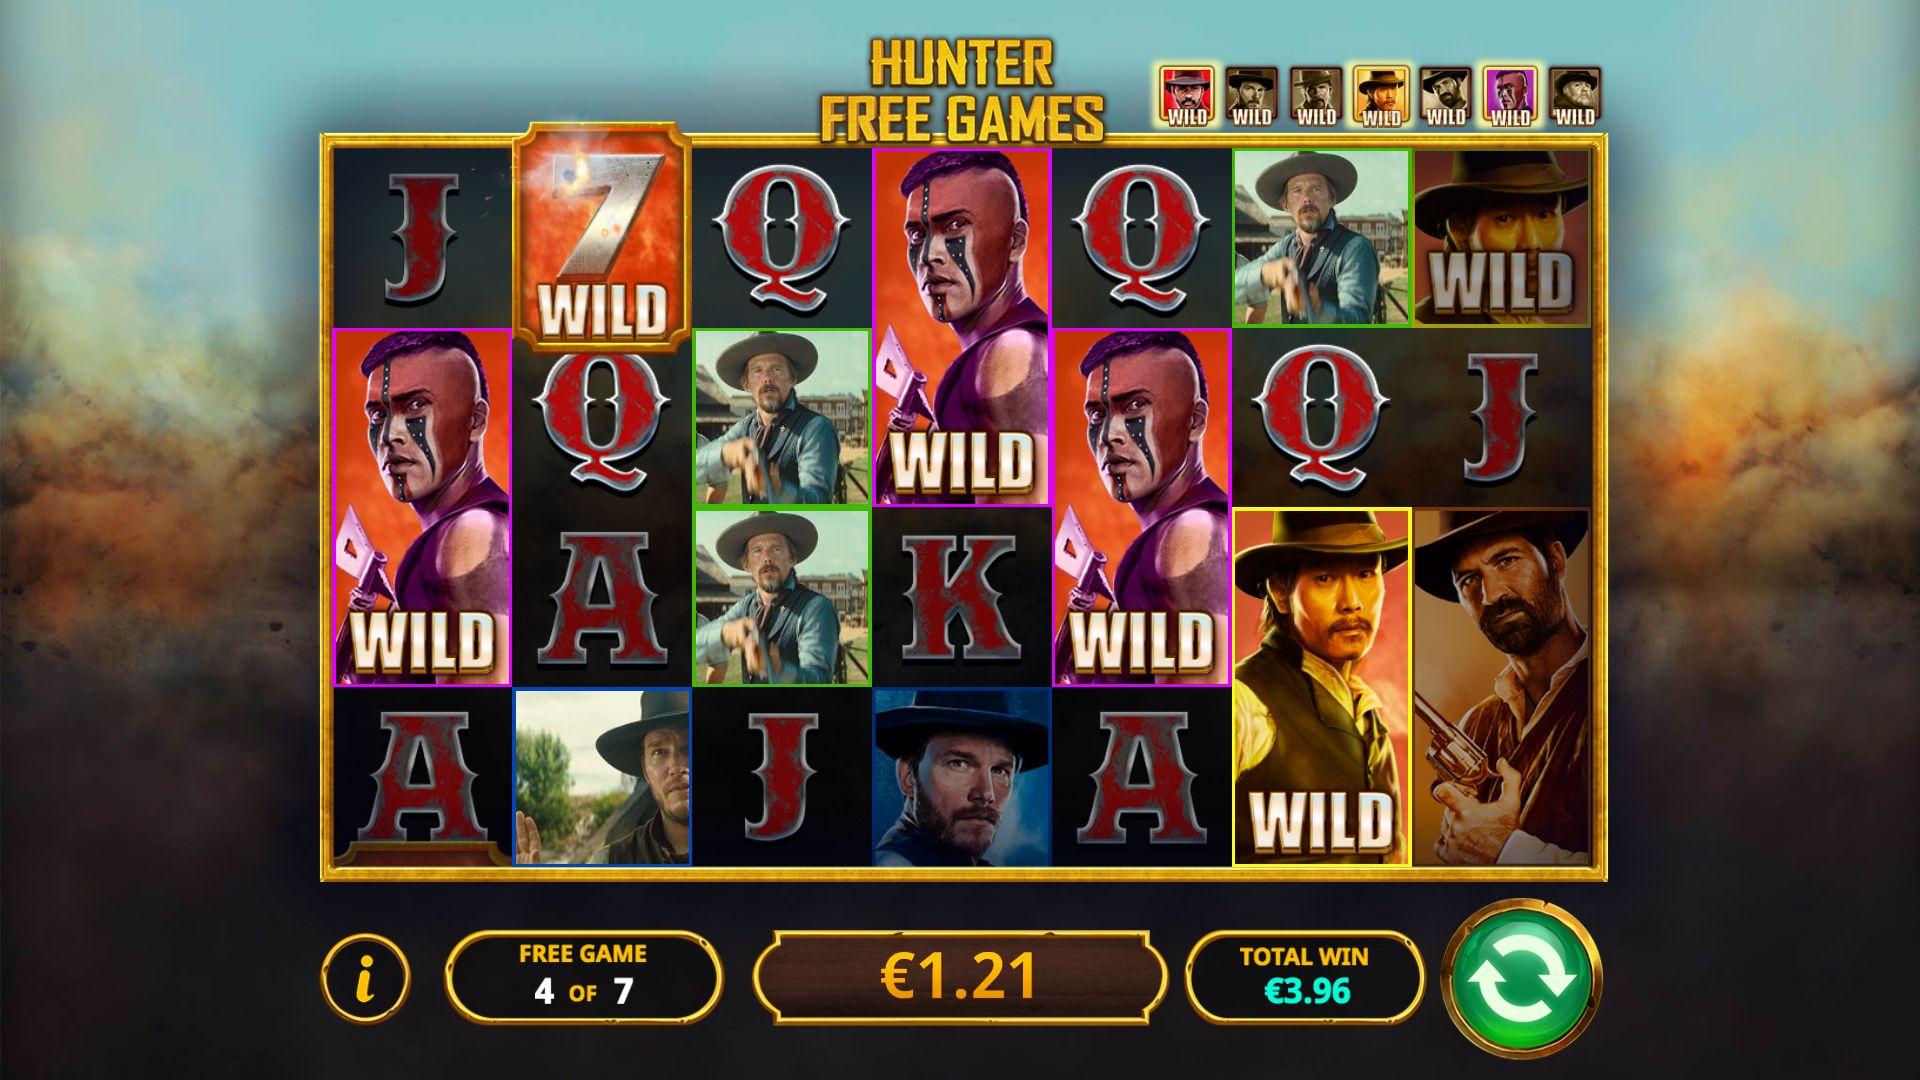 Hunter Free Games